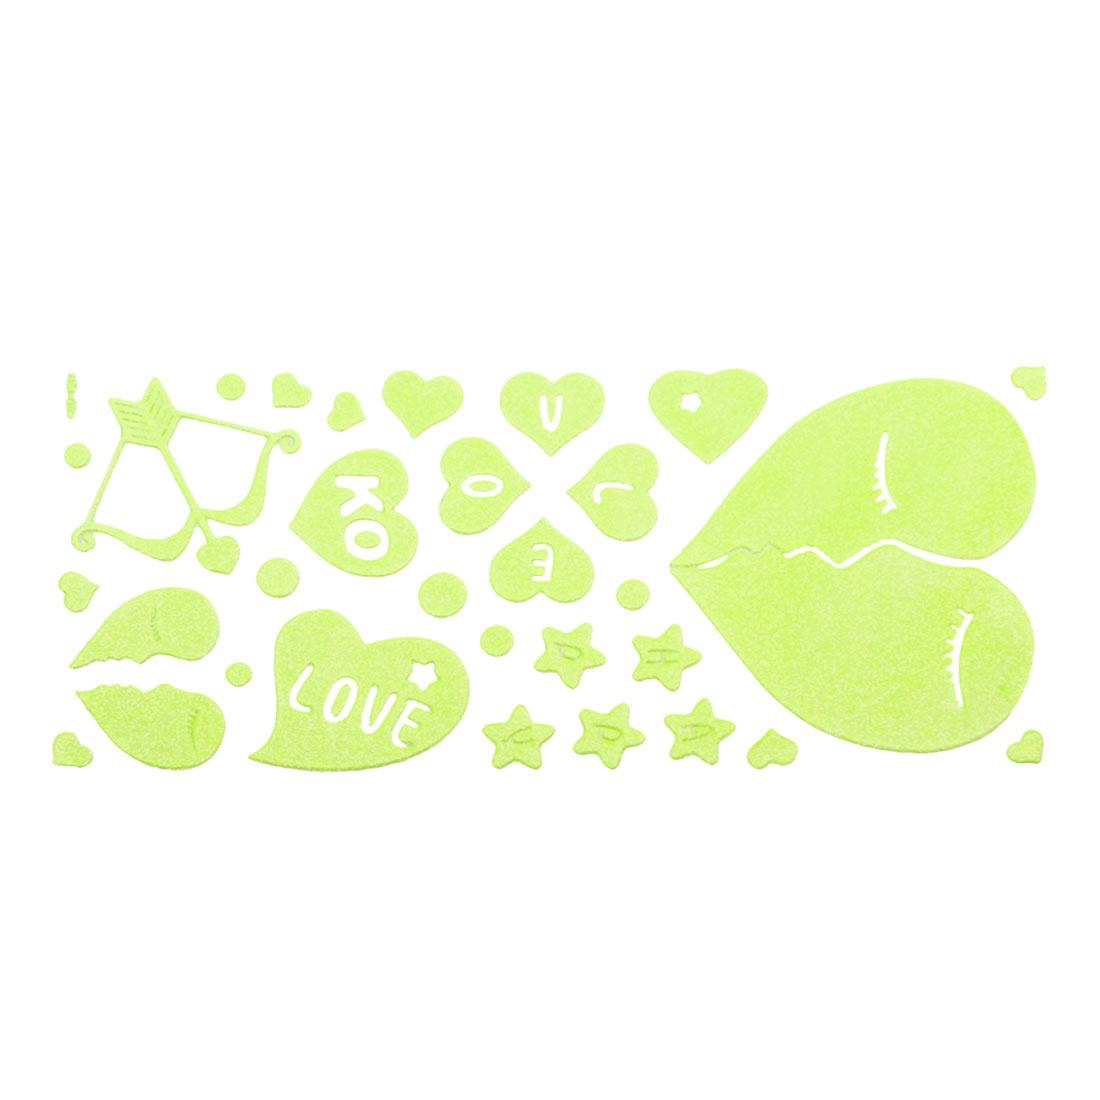 Room Decor Star Heart Shaped Light Green Luminous Stickers 30 in 1 Set